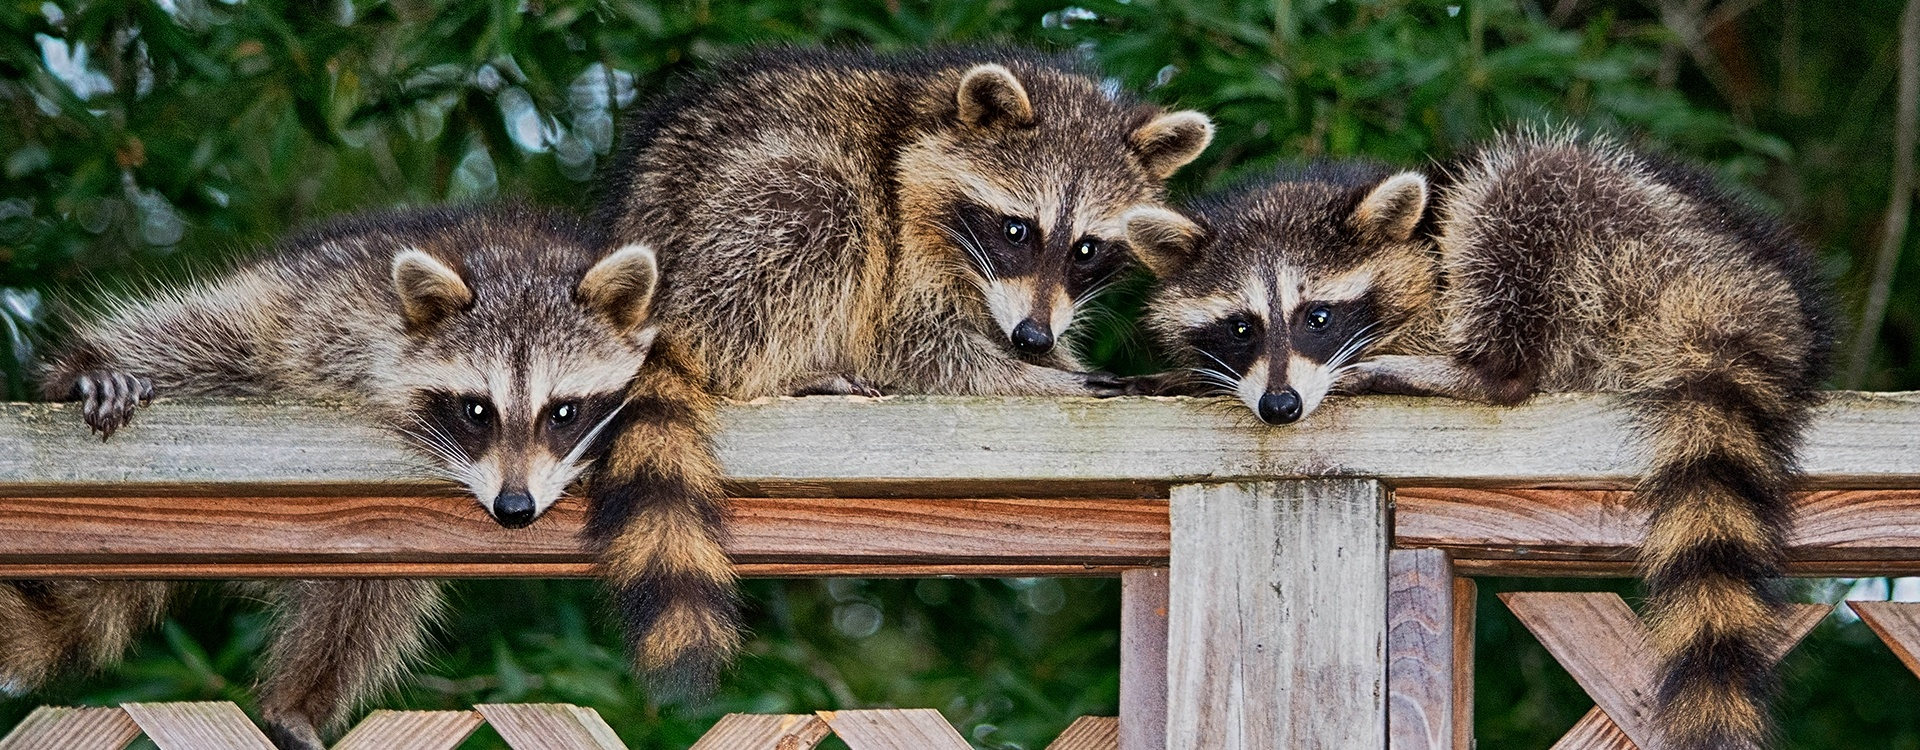 raccoons climbing a wooden fence